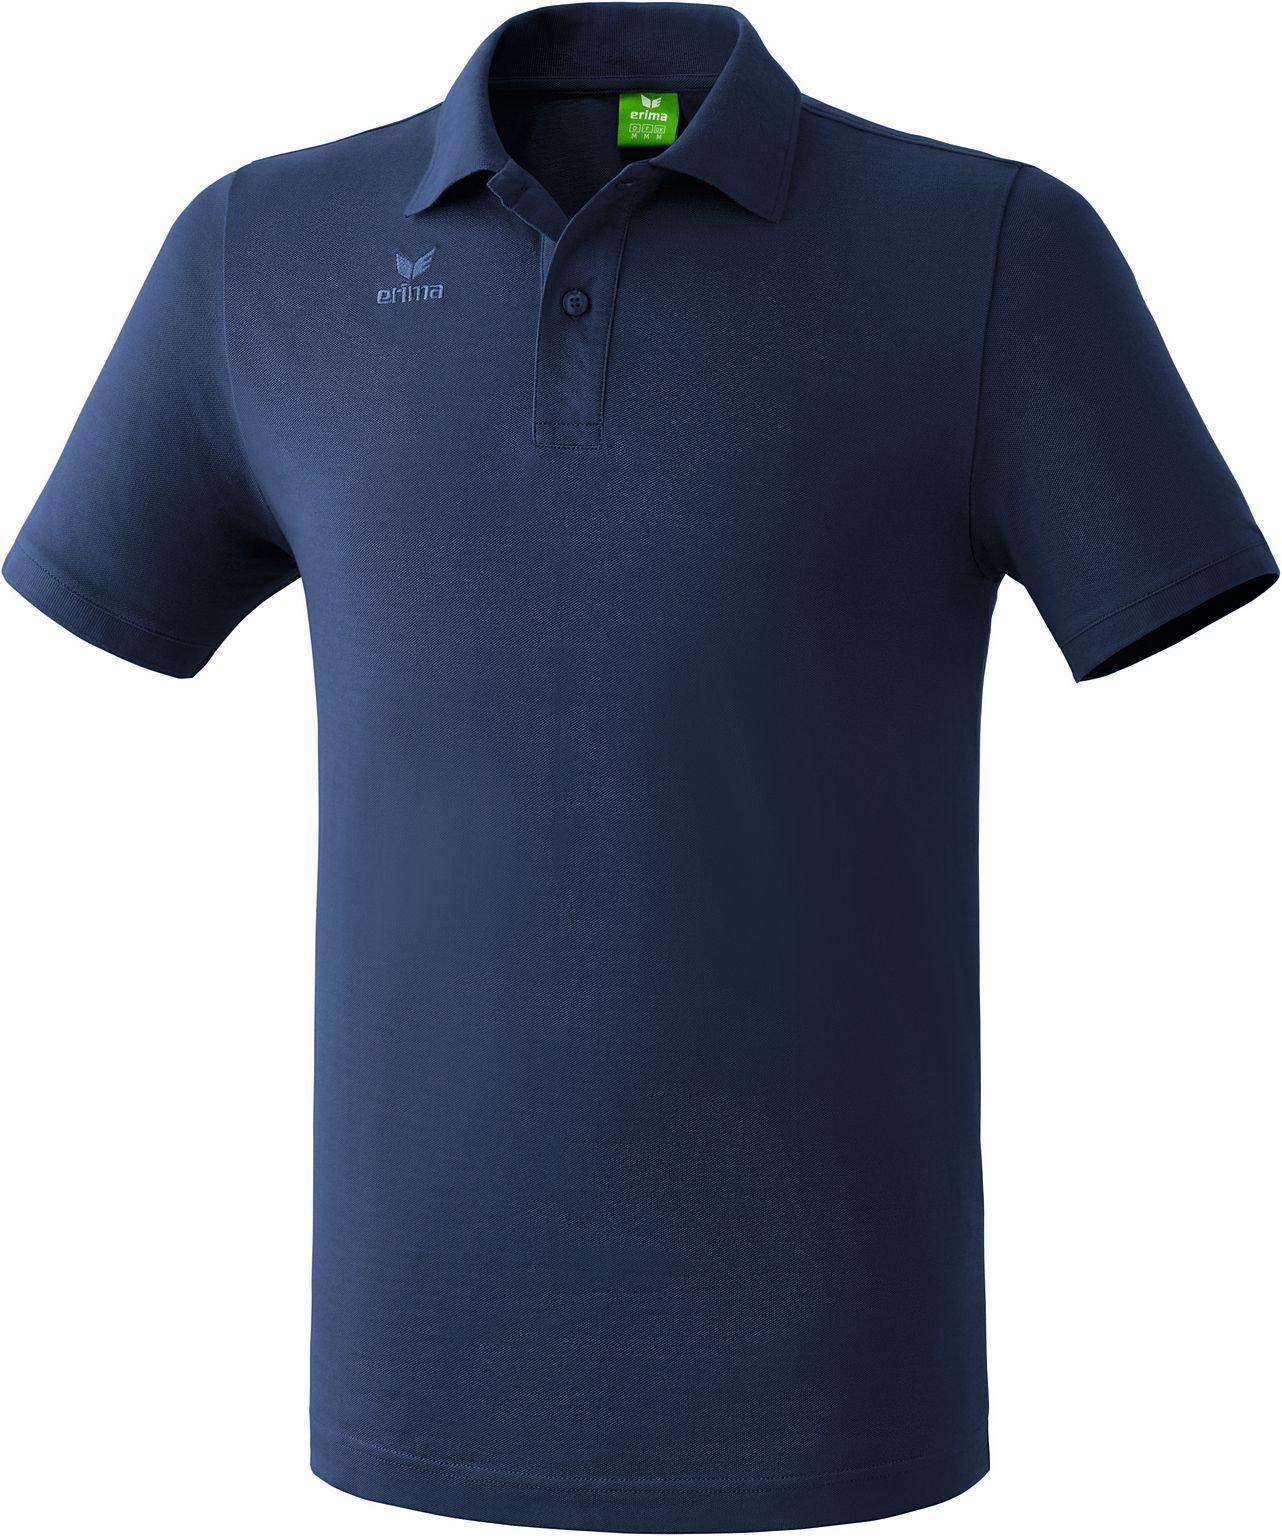 Baumwolle Poloshirt Herren